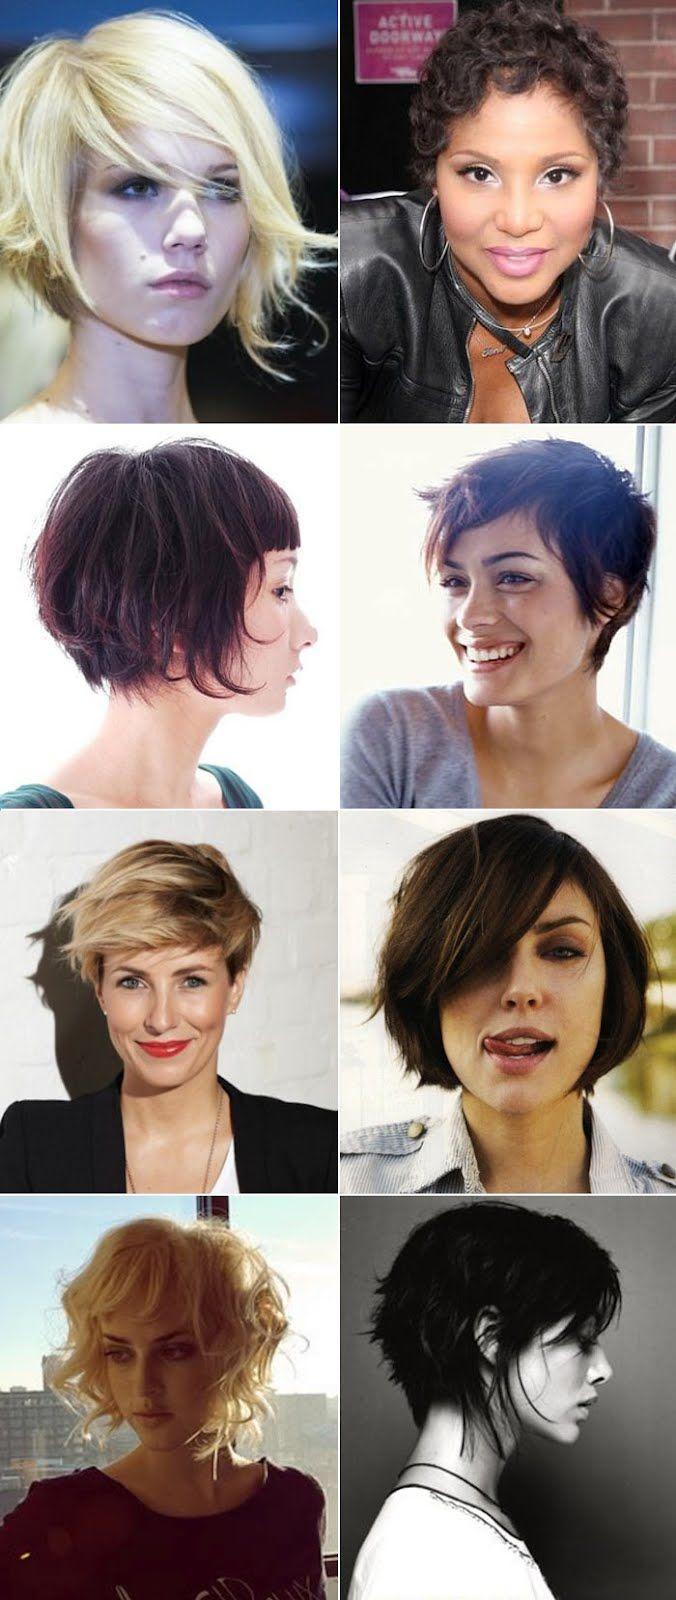 25 melhores ideias de cortes de cabelo preto no pinterest cabelo curto relaxado penteados tran ados curtos e penteados curtos afro americano